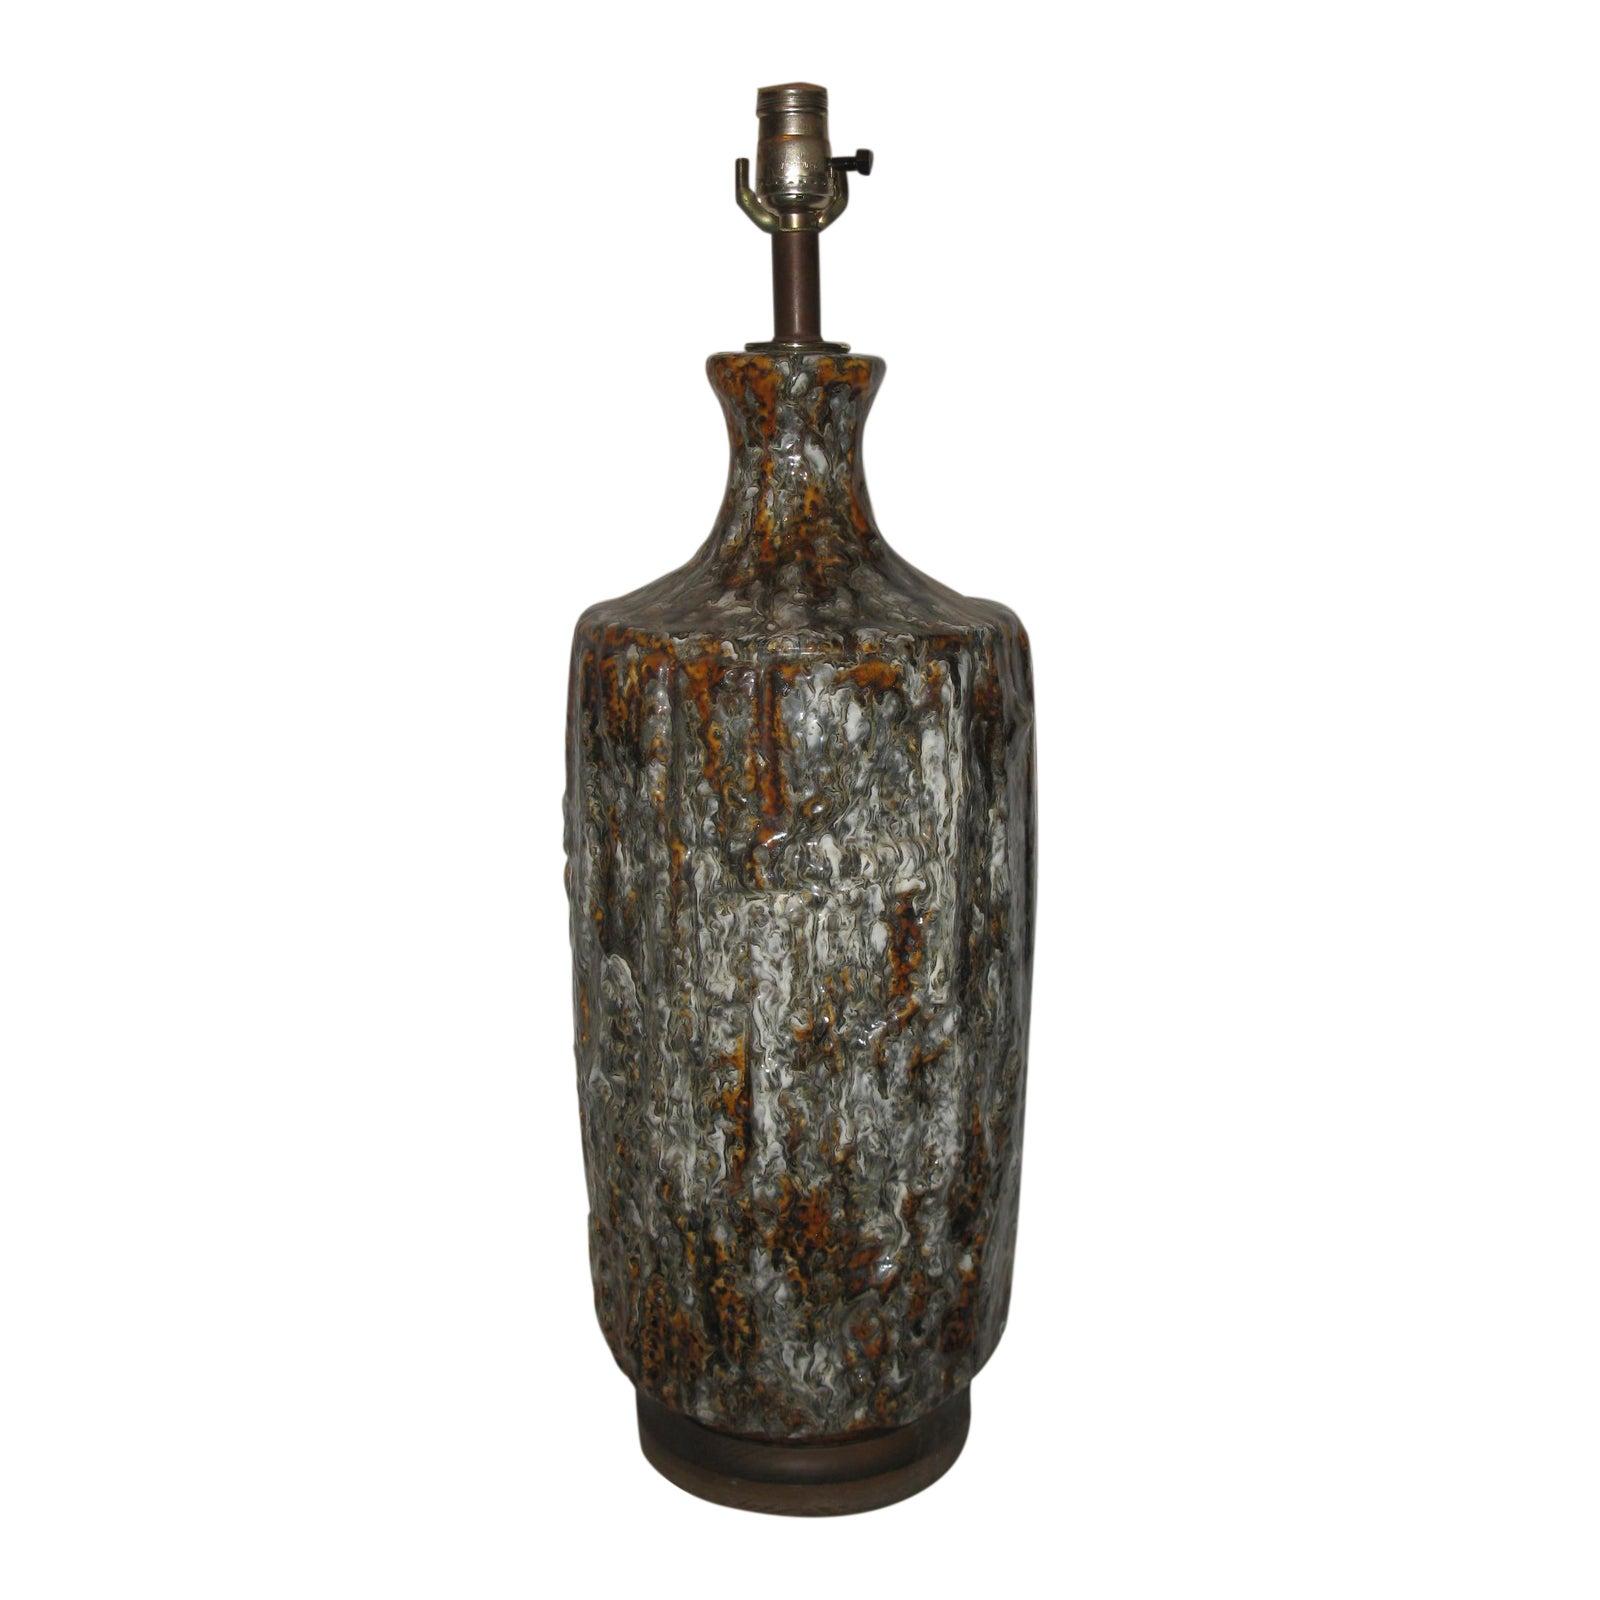 Ceramic Drip Glaze Vintage Mid Century Modern Table Lamp Chairish